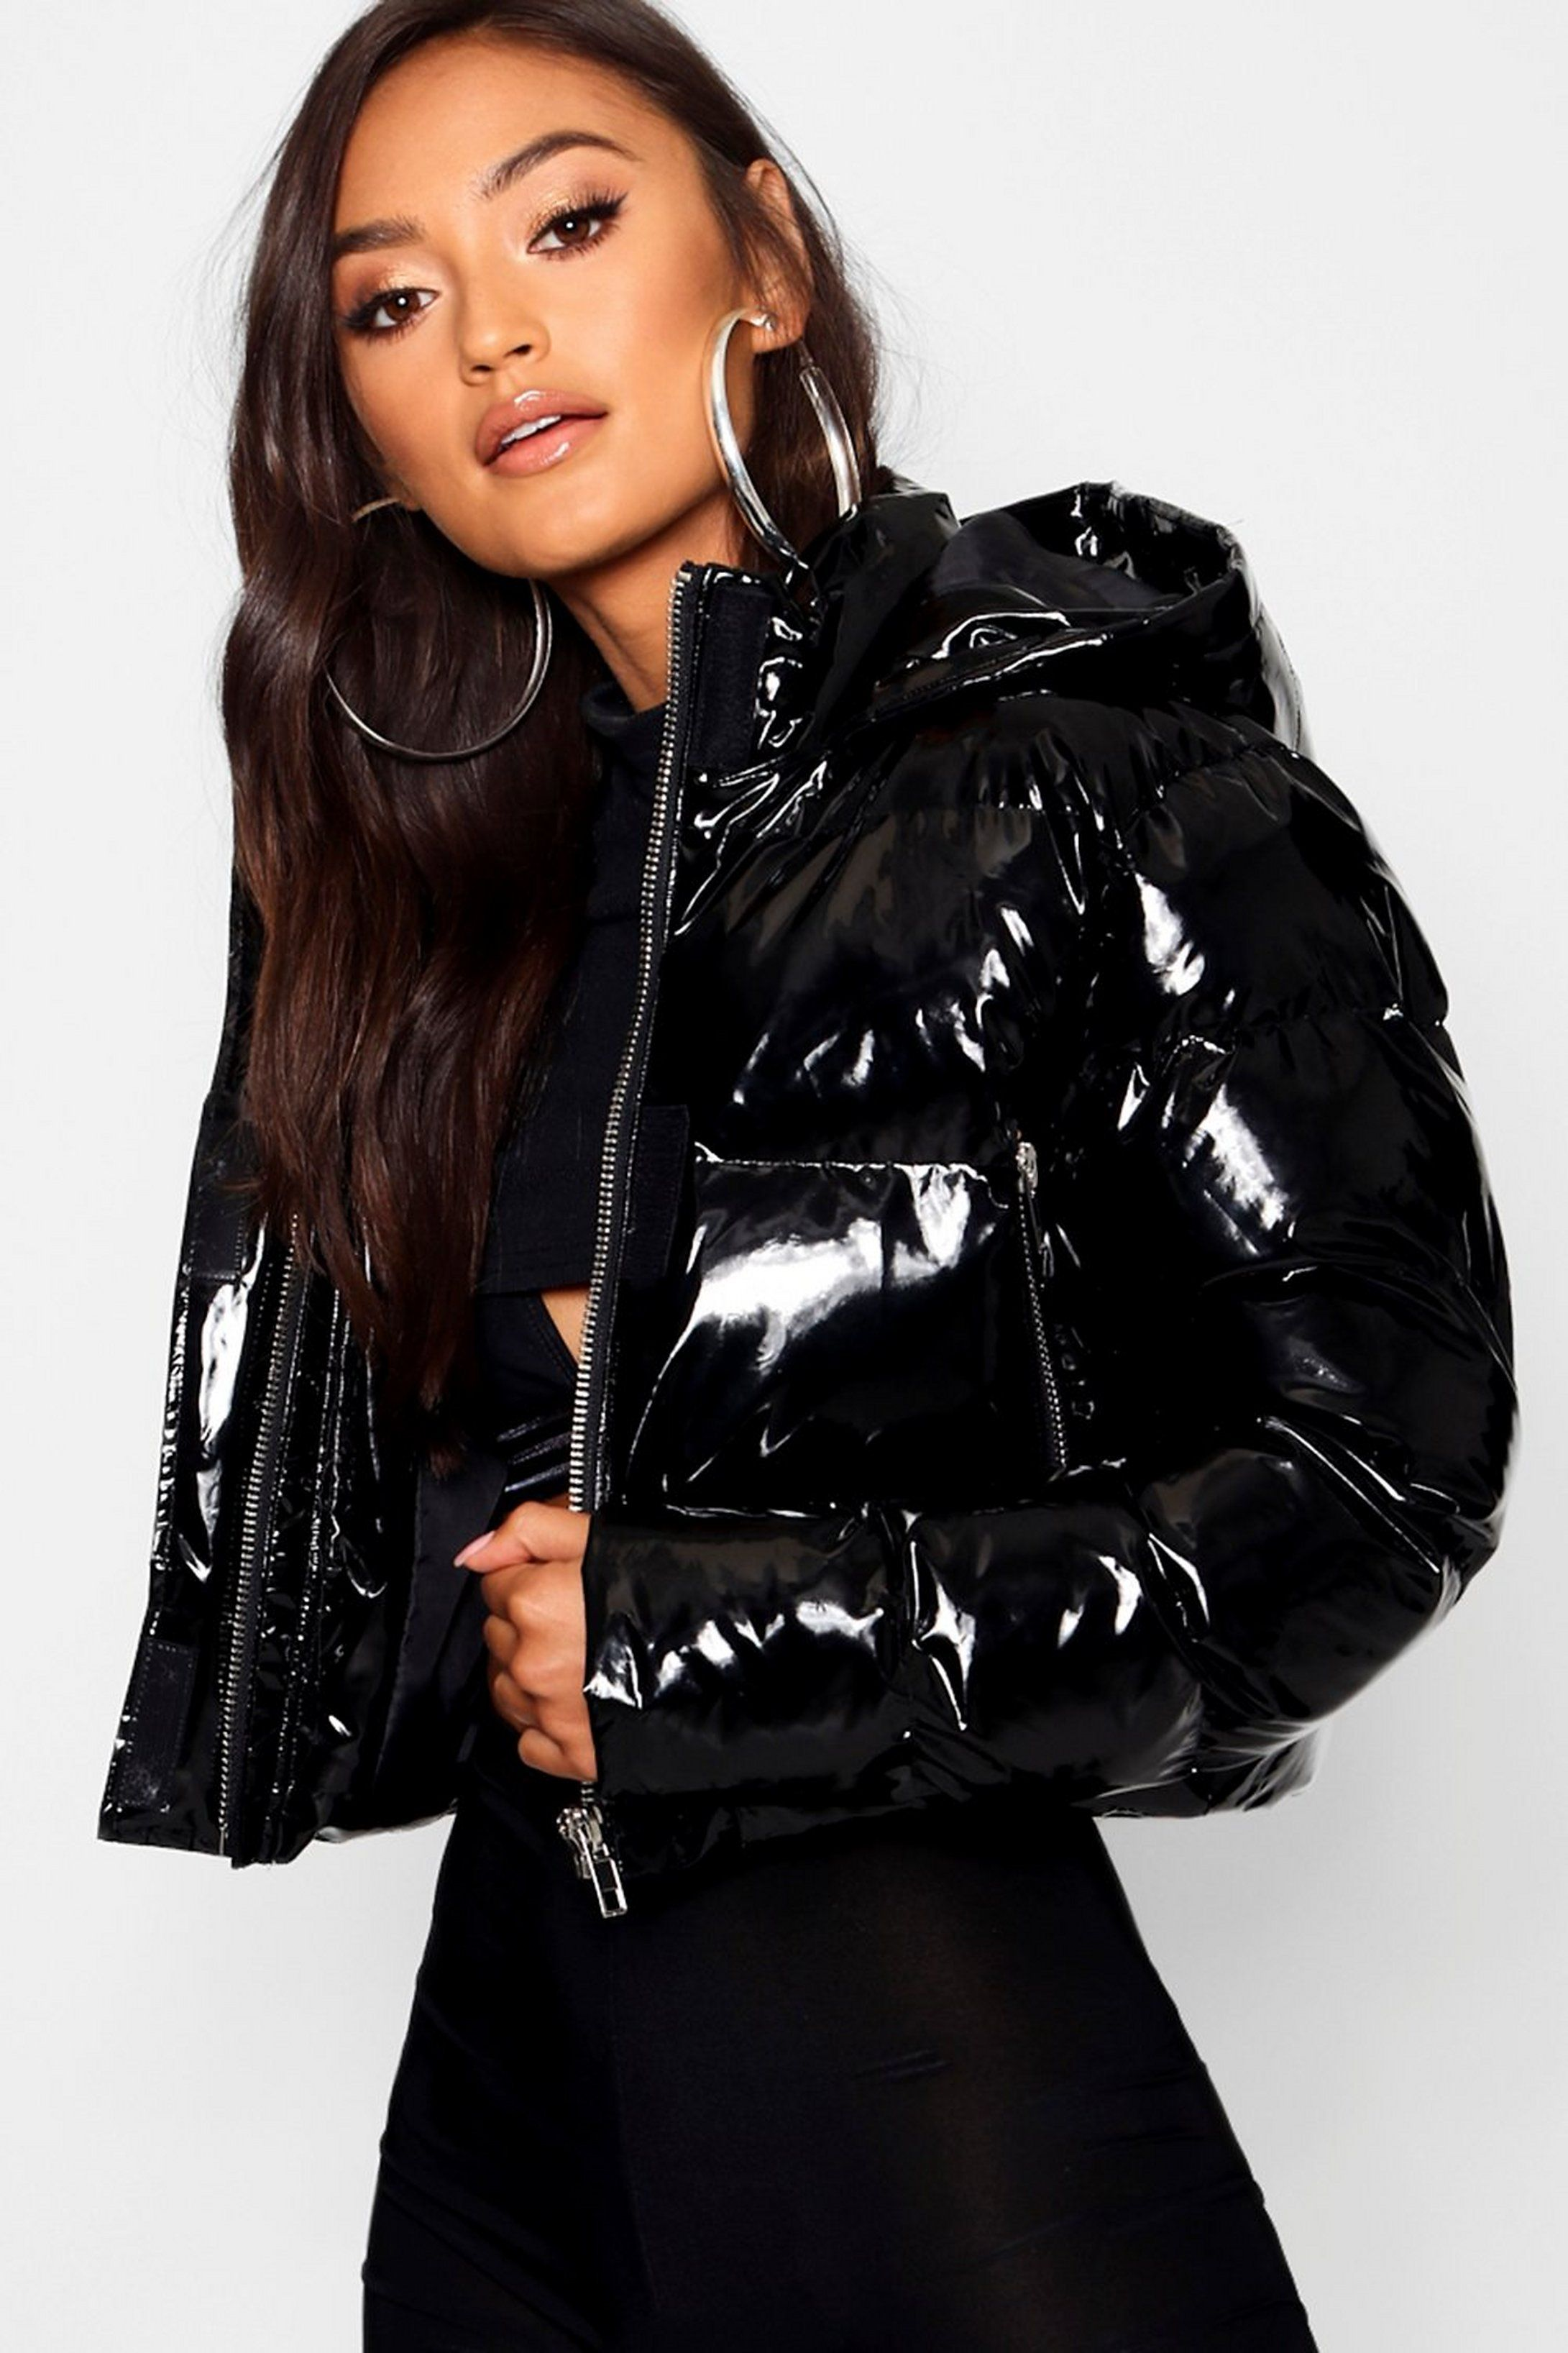 Petite Hooded Crop High Shine Coat Boohoo Uk In 2020 Bubble Coat Shiny Jacket Bubble Jacket Outfit